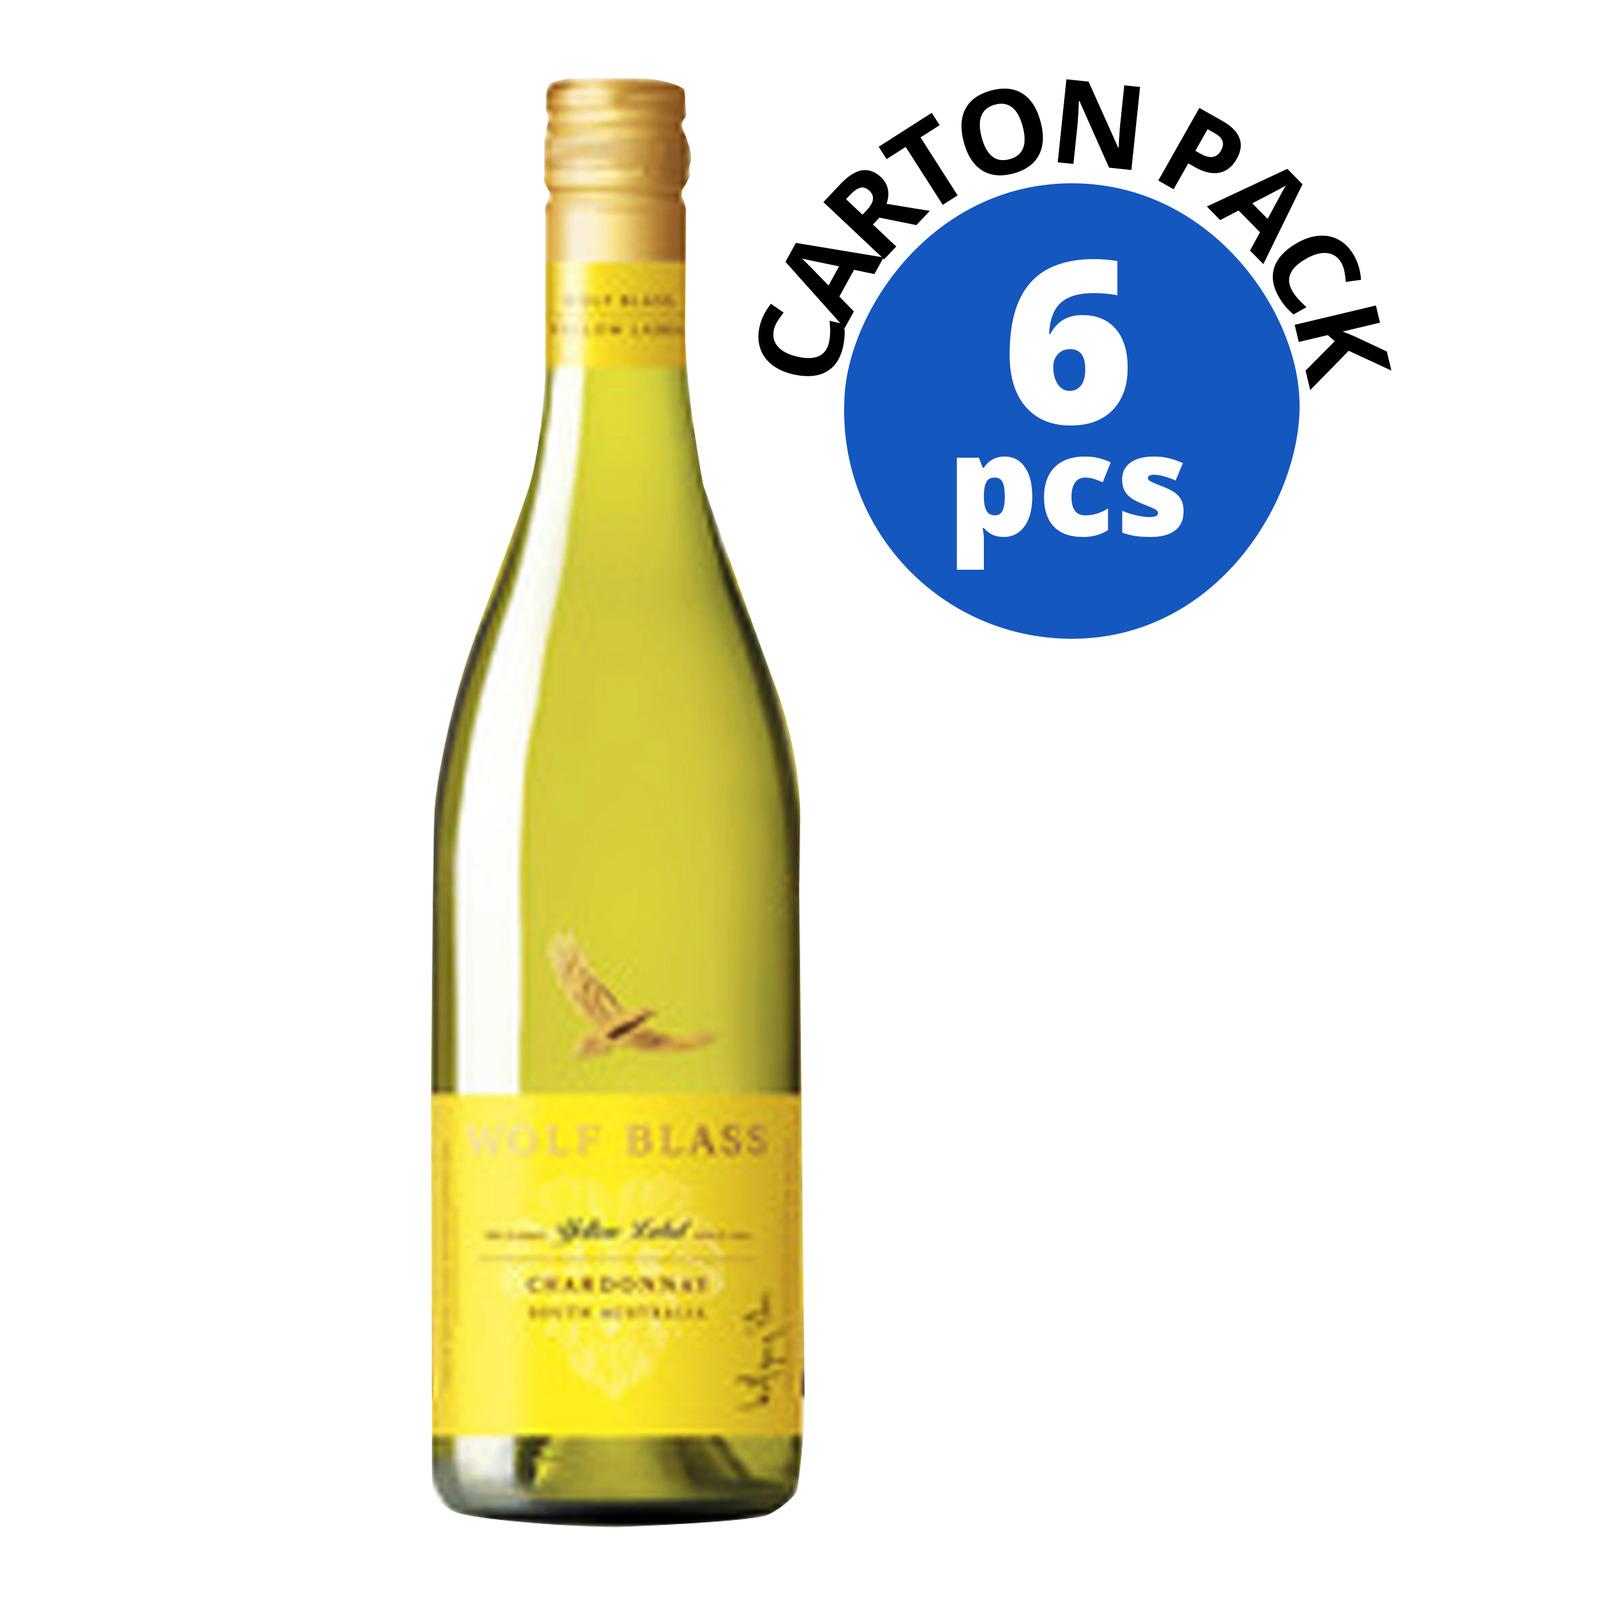 Wolf Blass Yellow Label White Wine - Chardonnay